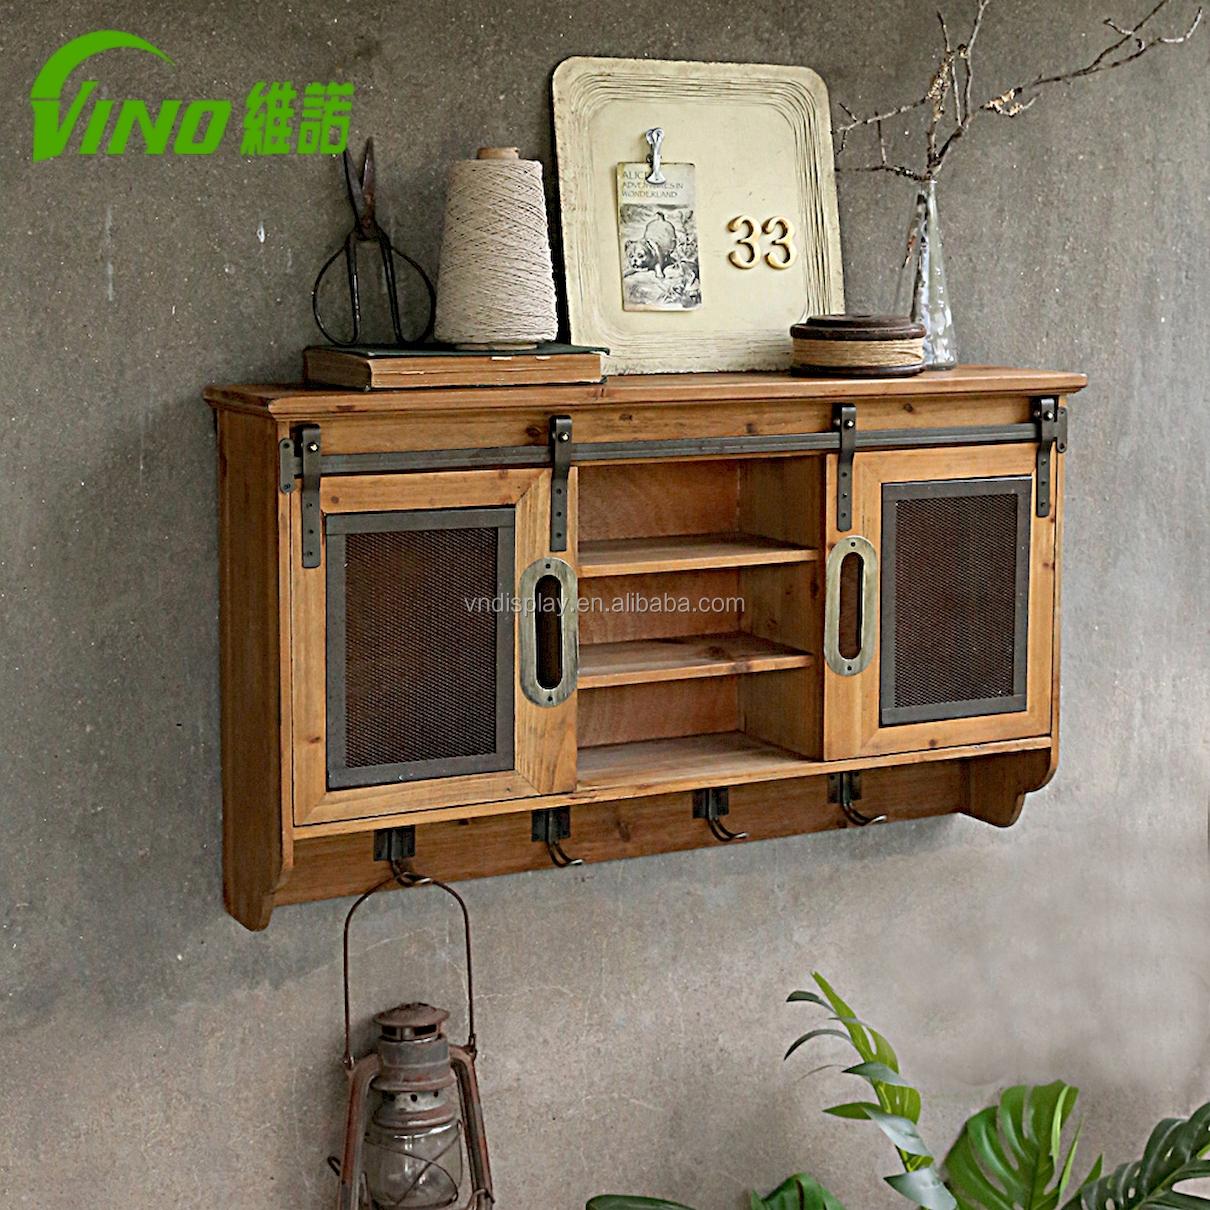 Kabinet Kayu Kotak Laci Kayu Kabinet Dapur Kayu Buy Wooden Cabinet Wood Drawer Box Wood Kitchen Cabinet Product On Alibaba Com